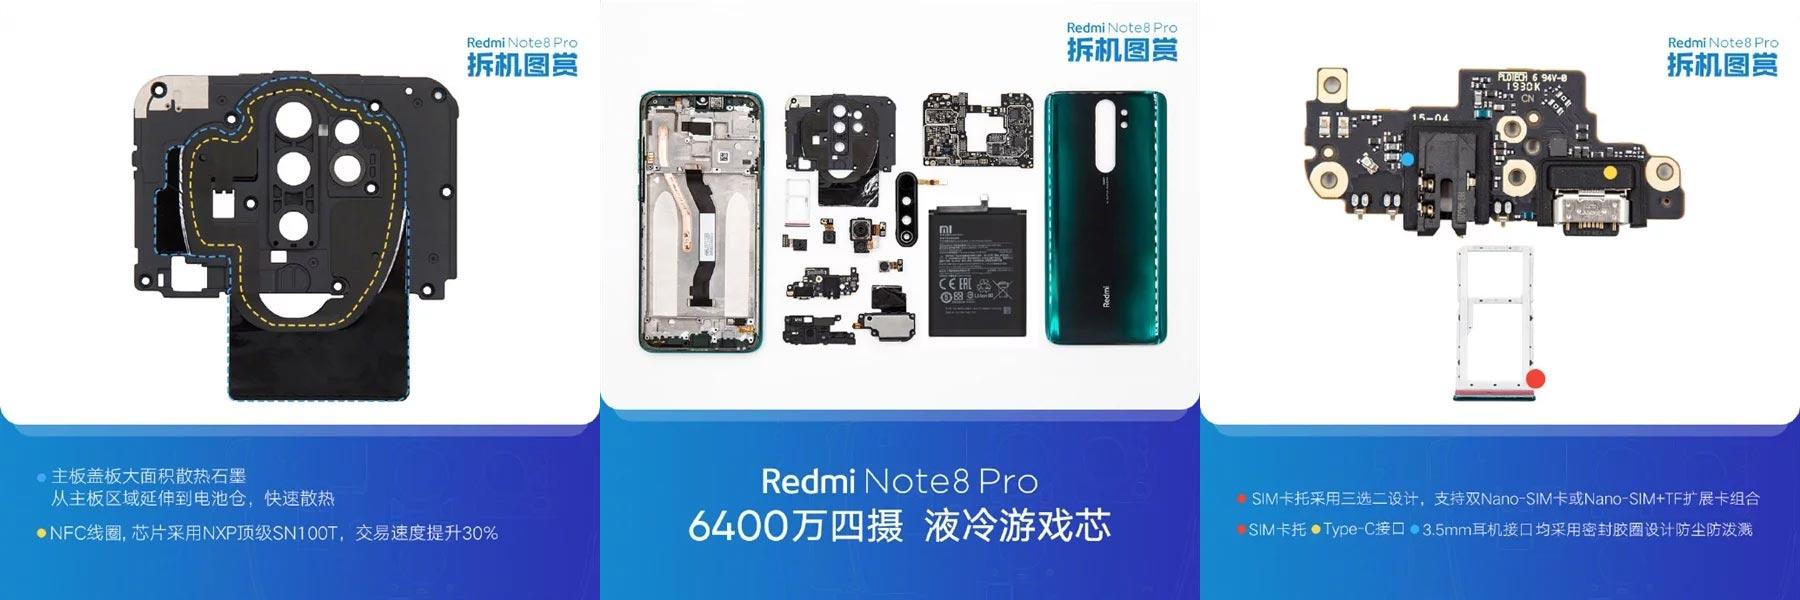 Redmi Note 8 Pro Teardown